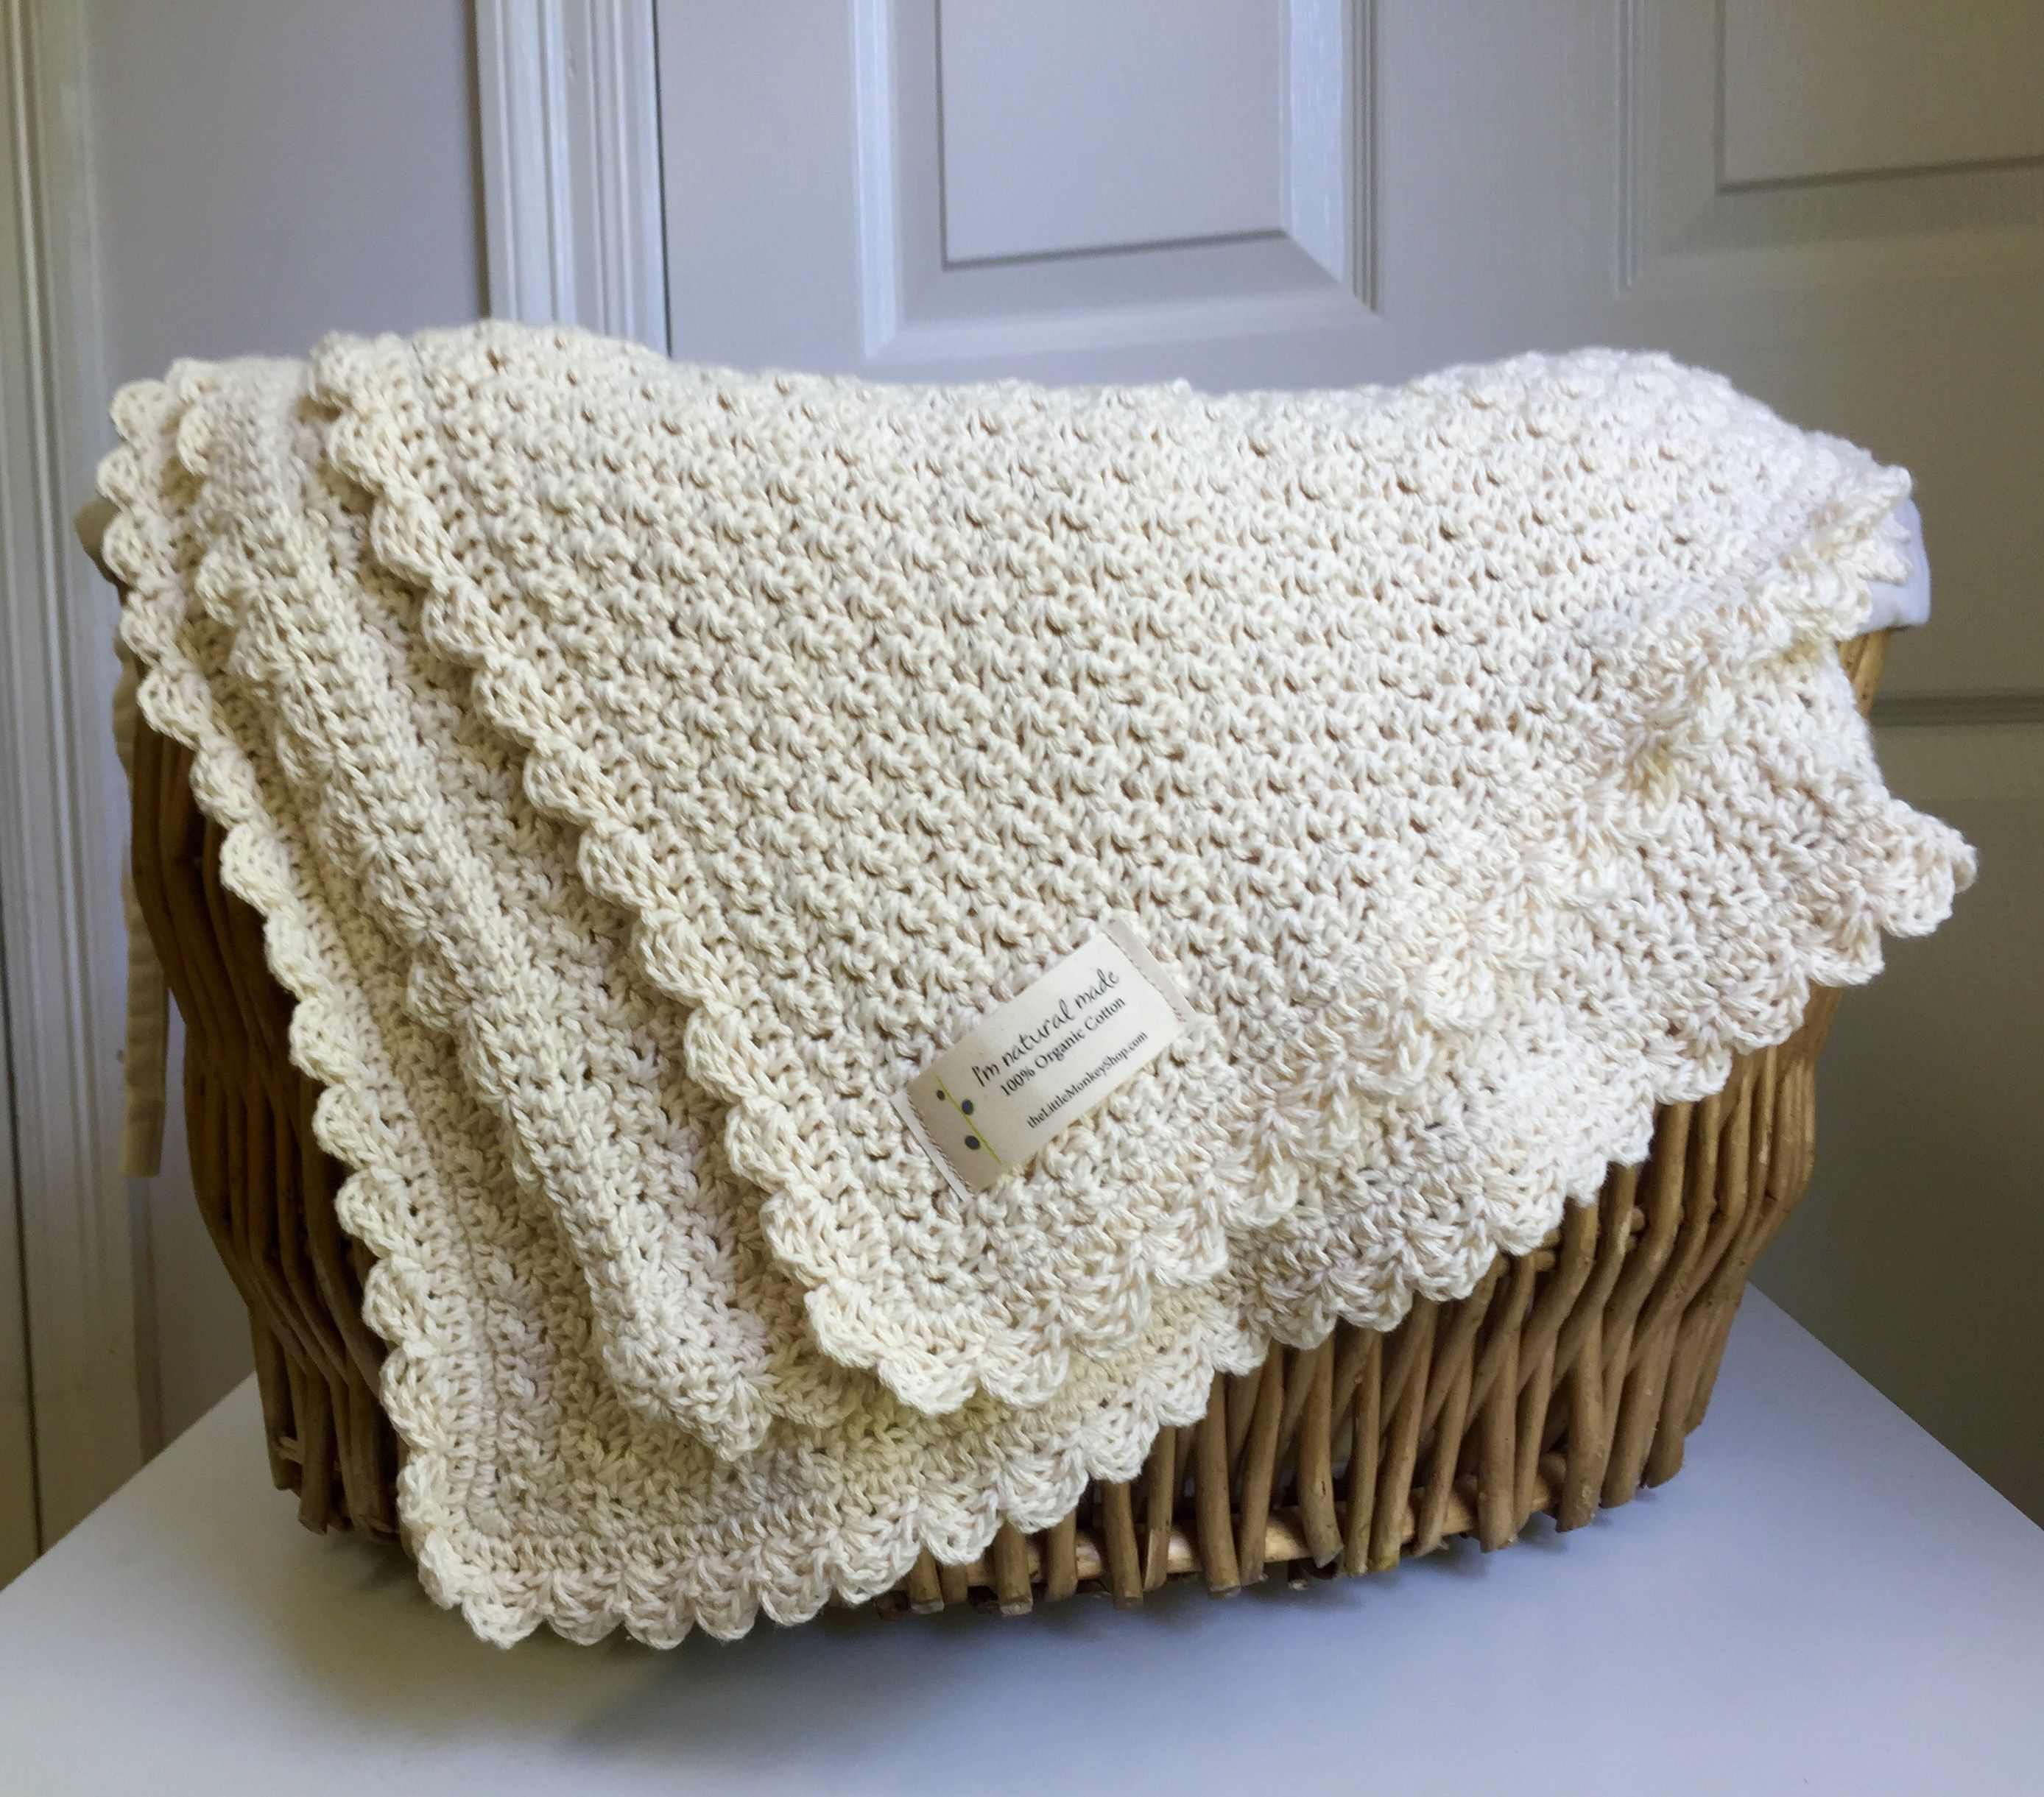 Crochet Pattern - Pure and Simple Baby Blanket | crochet | Pinterest ...